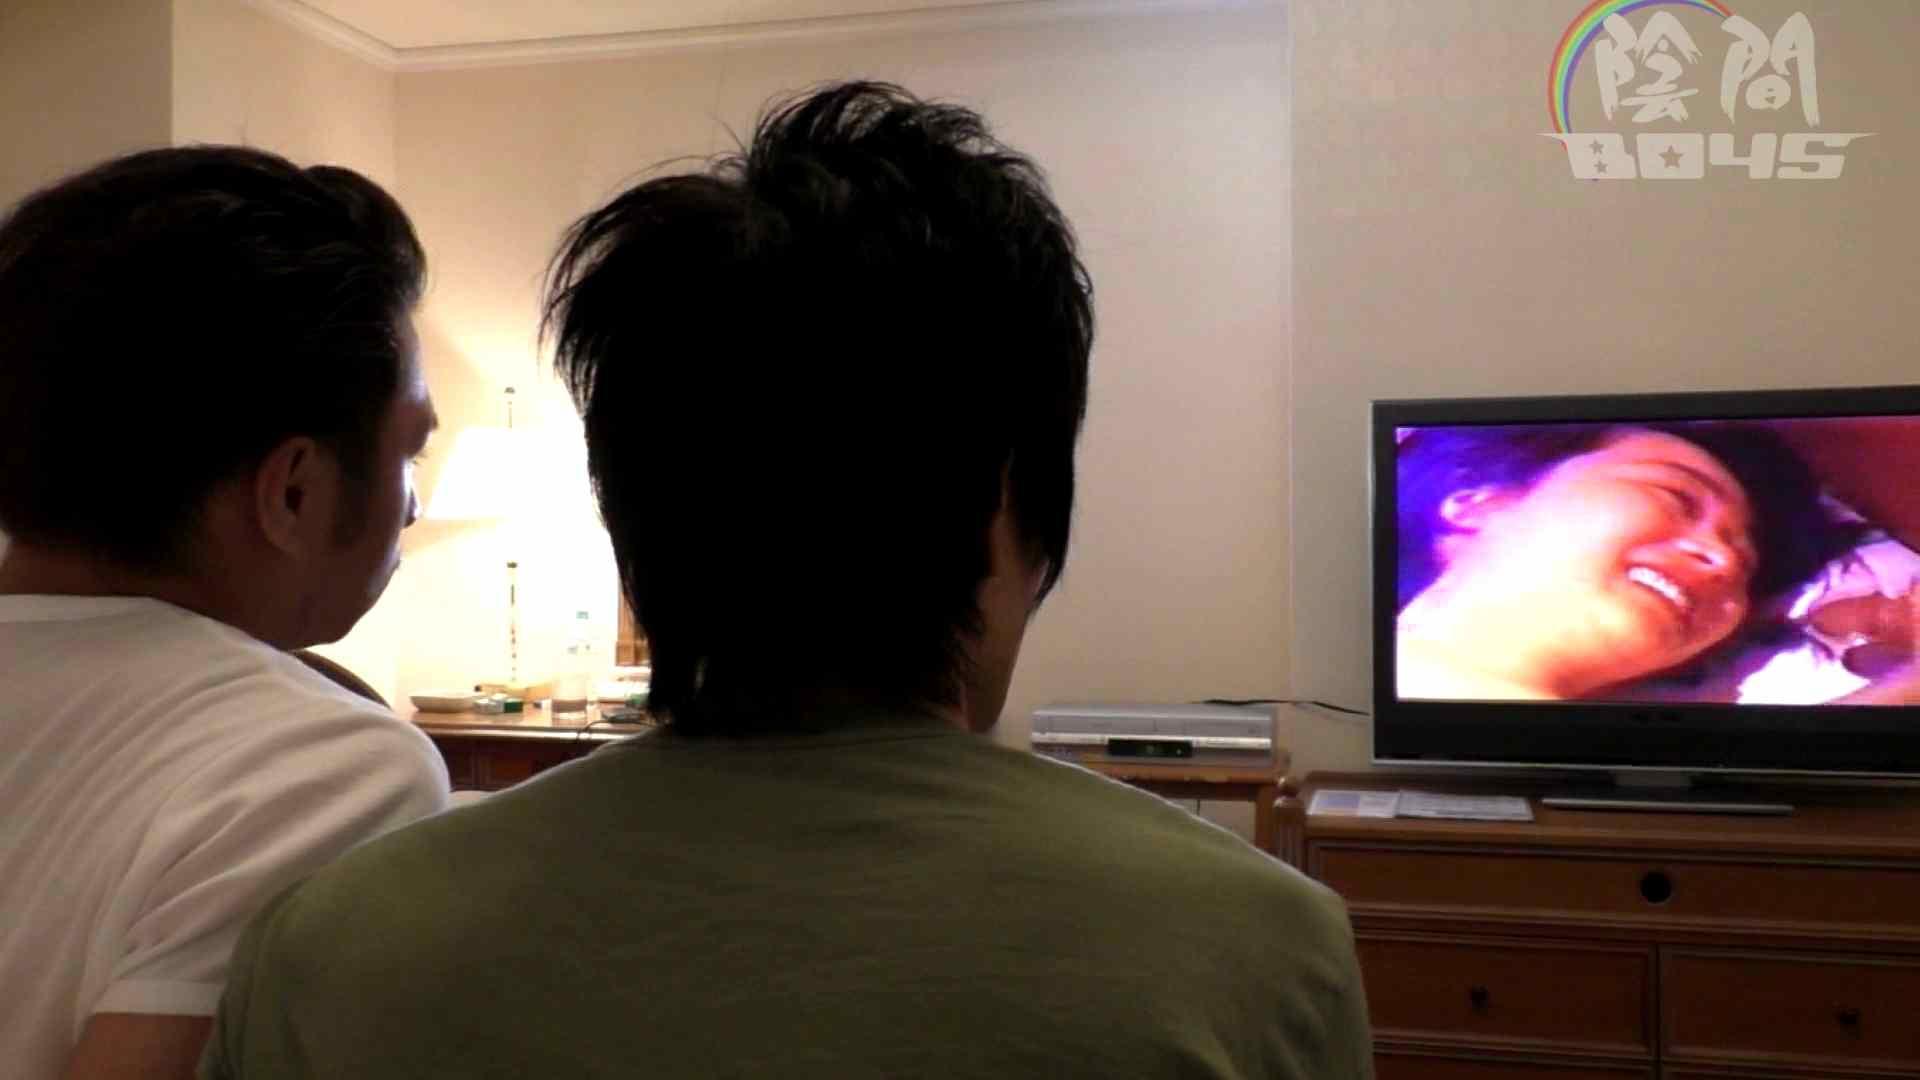 "ADの""ヒミツ""のお仕事 part1 No.01【期間限定】 モザイク無し ゲイ丸見え画像 93pic 66"